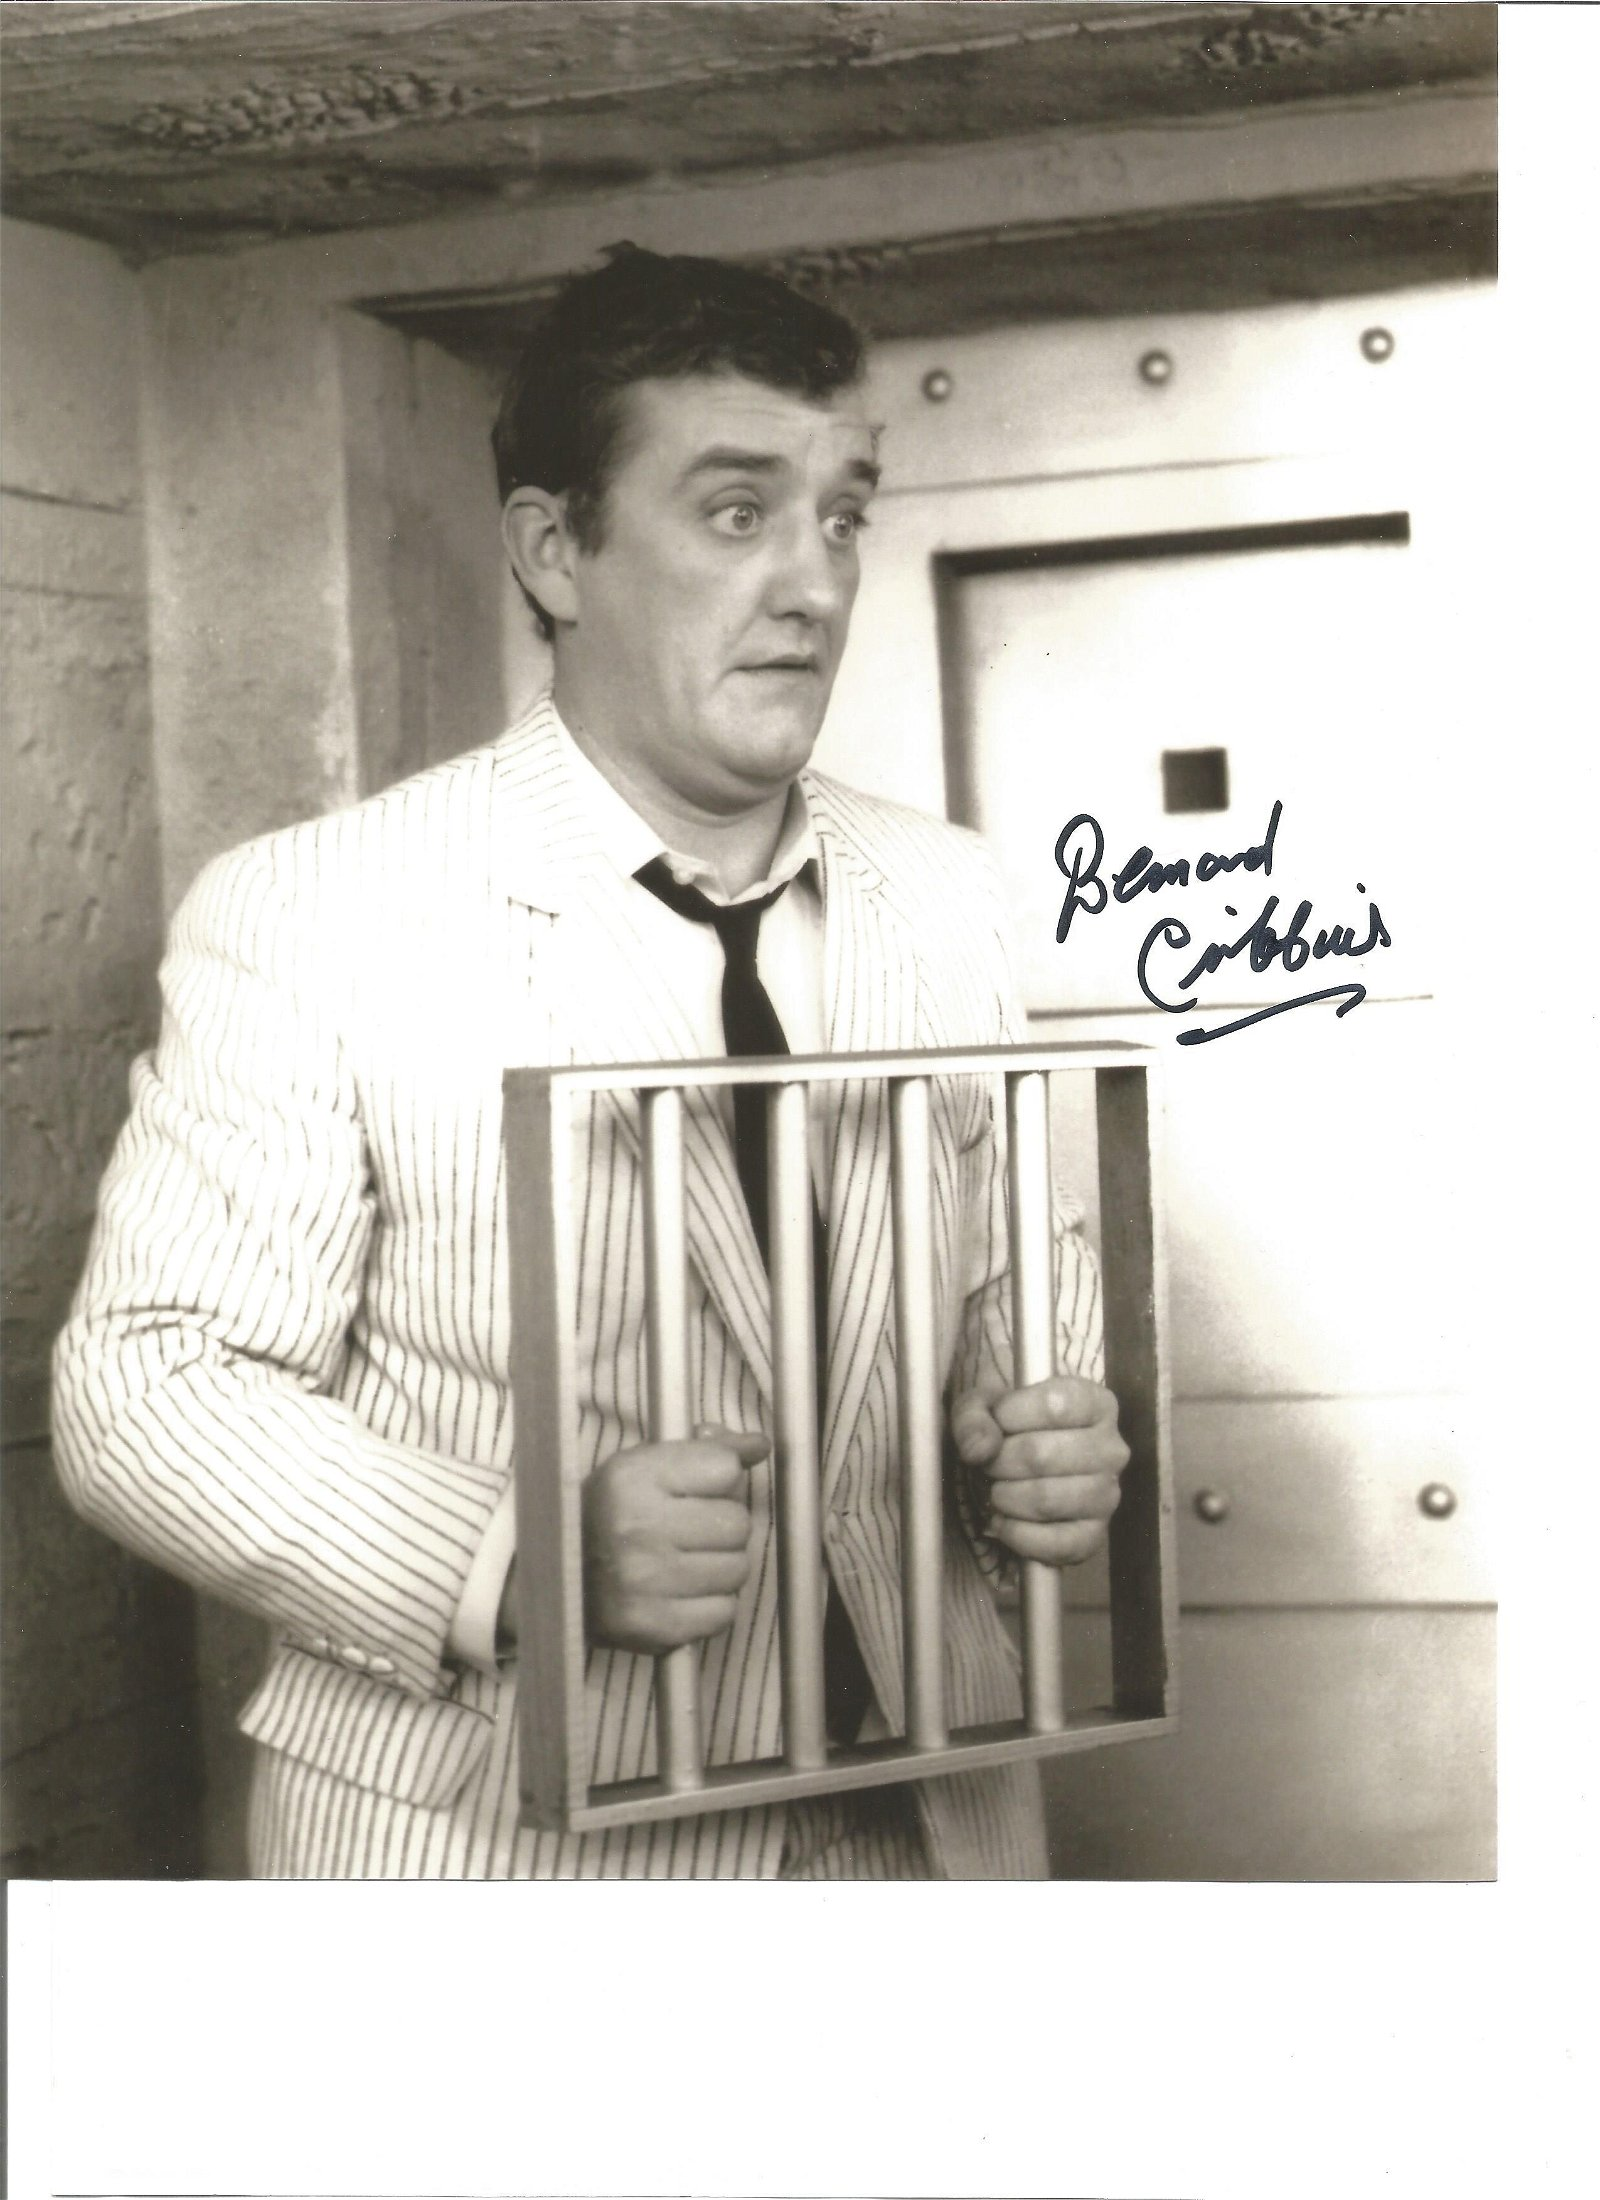 Bernard Cribbins 10x8 signed black and white photo